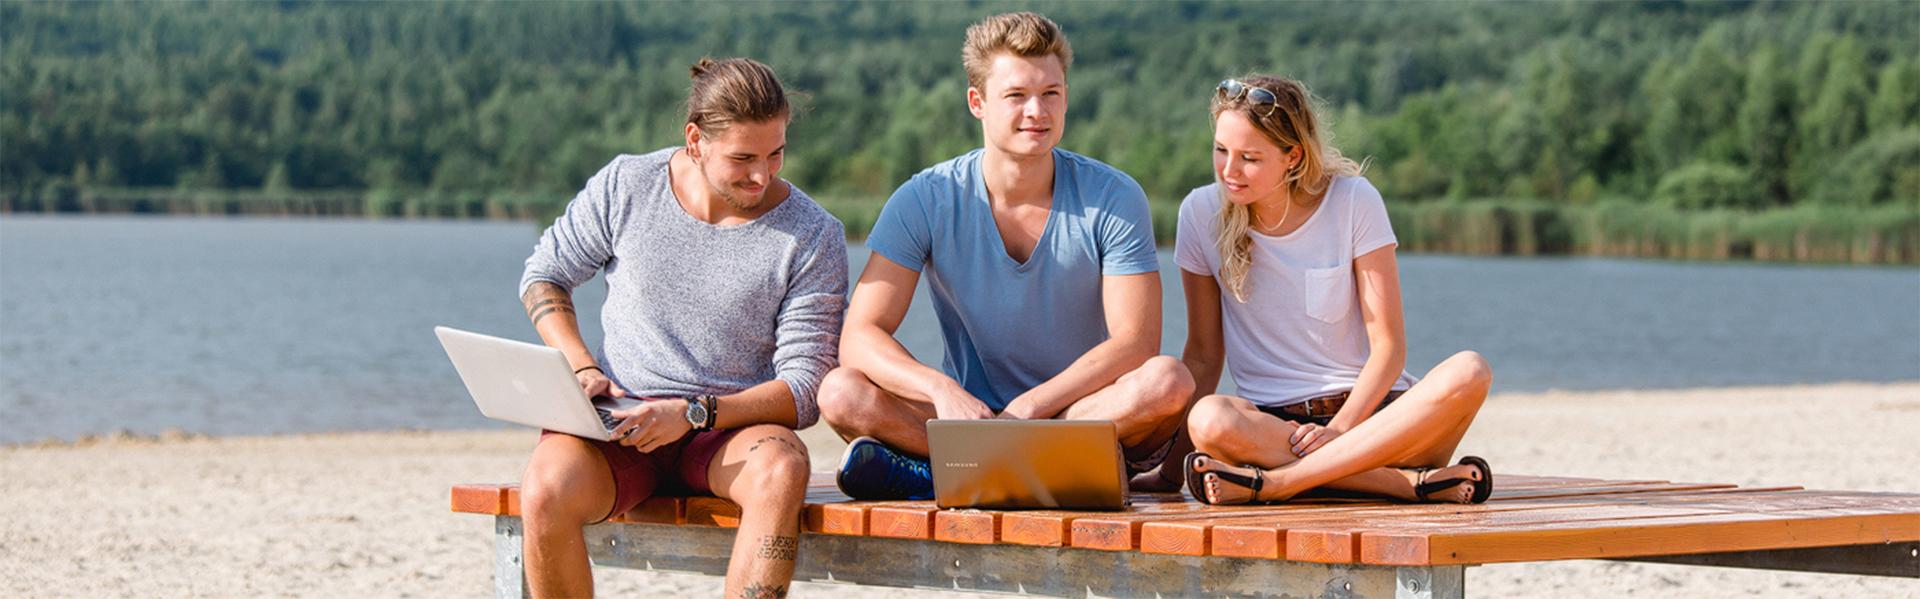 Bachelor Tourismusmanagement: Studierende arbeiten outside am Laptop